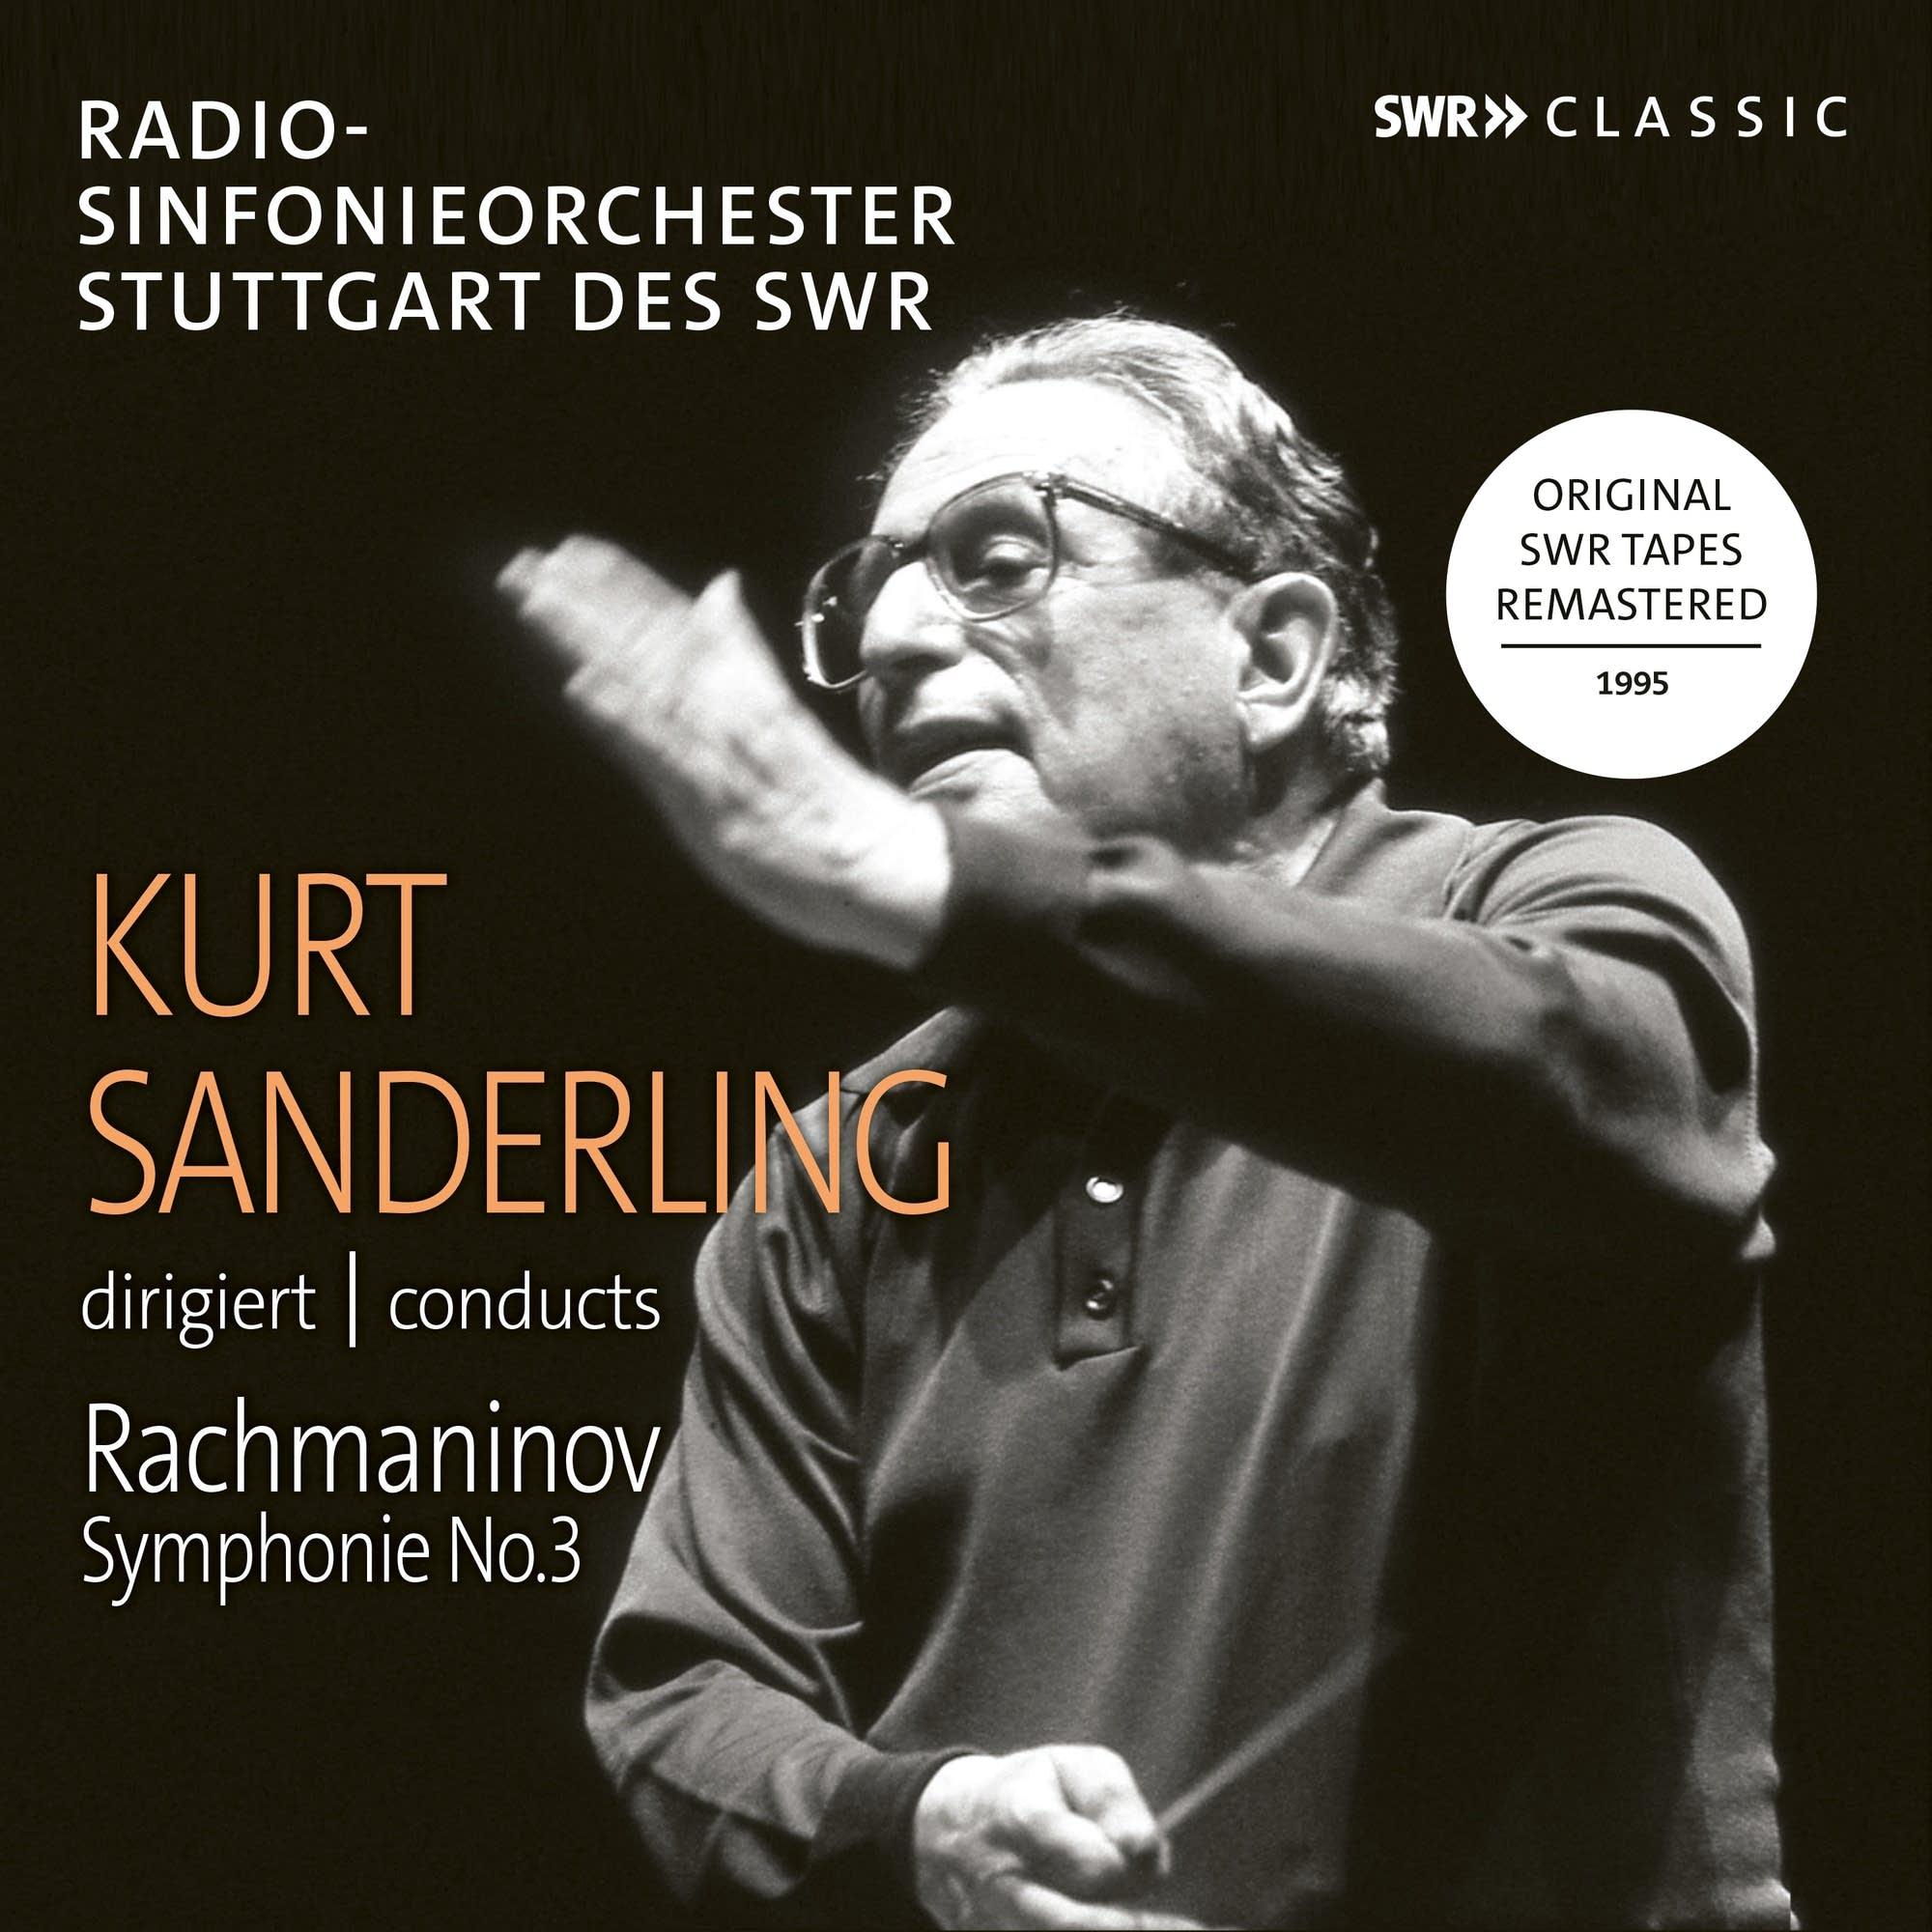 Modest Mussorgsky - Khovanshchina: Overture